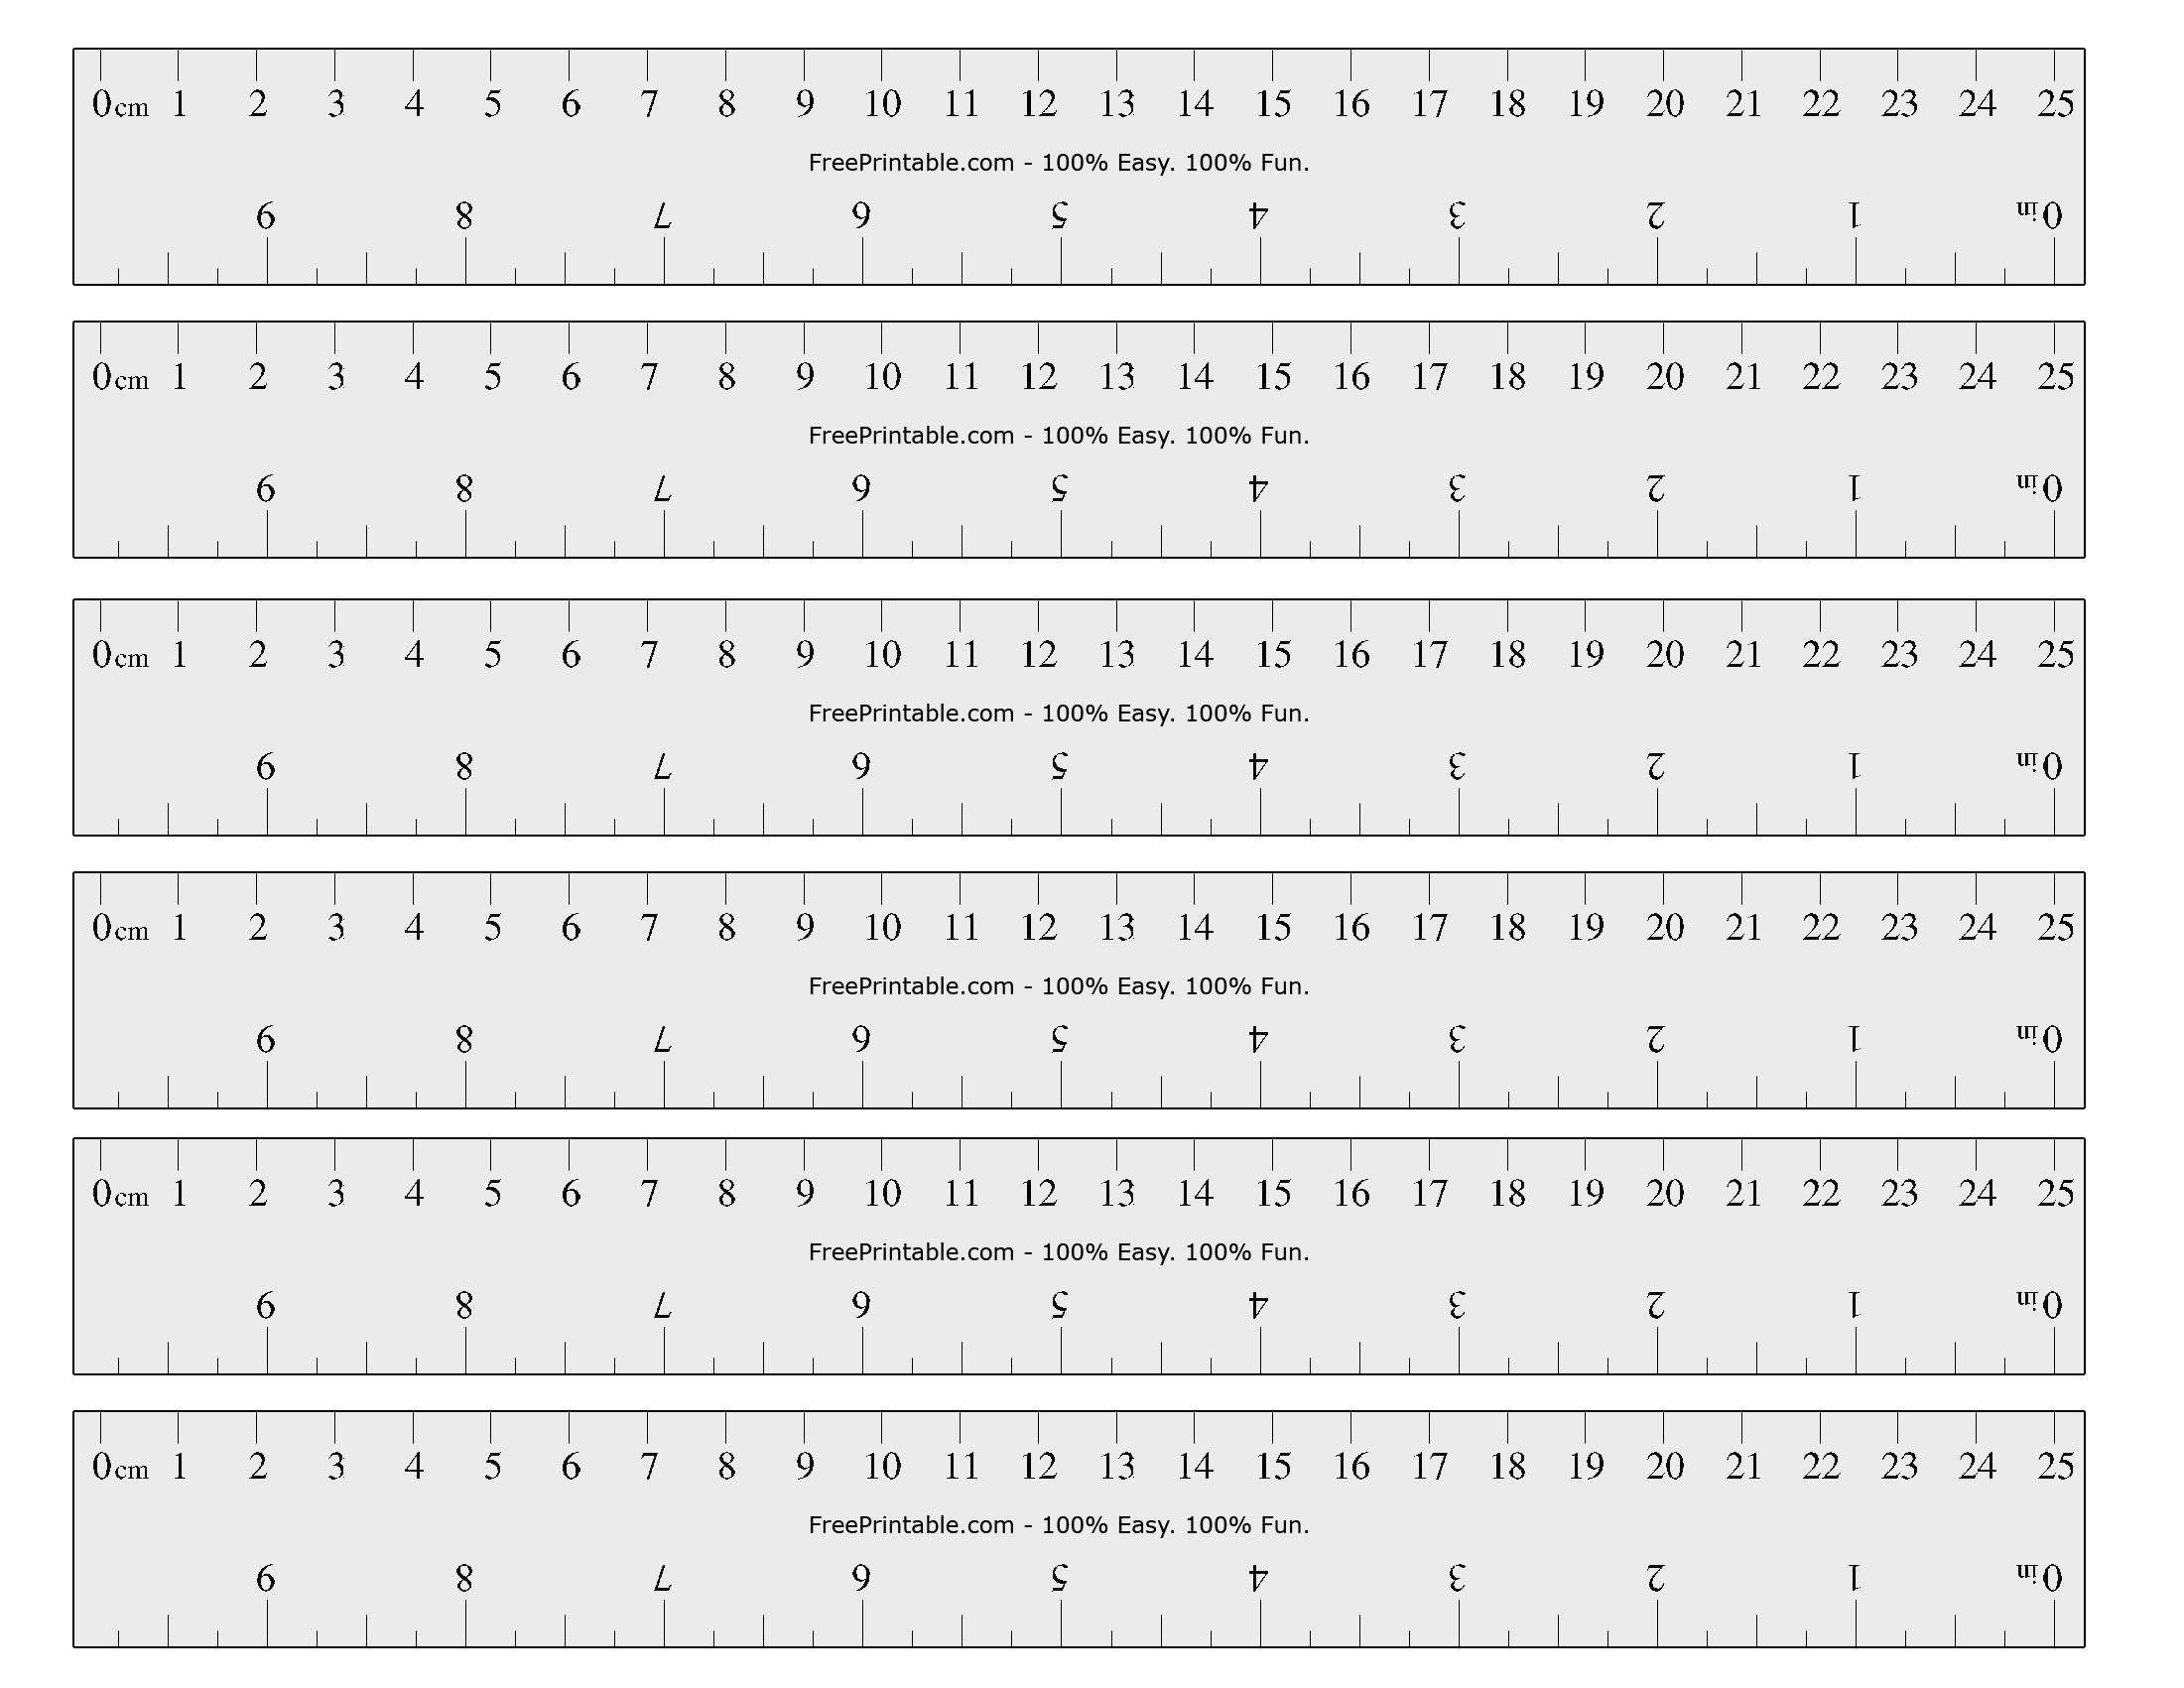 Free Printable Cm/inch Ruler   Math Mania!!   Printable Ruler, Free - Free Printable Ruler